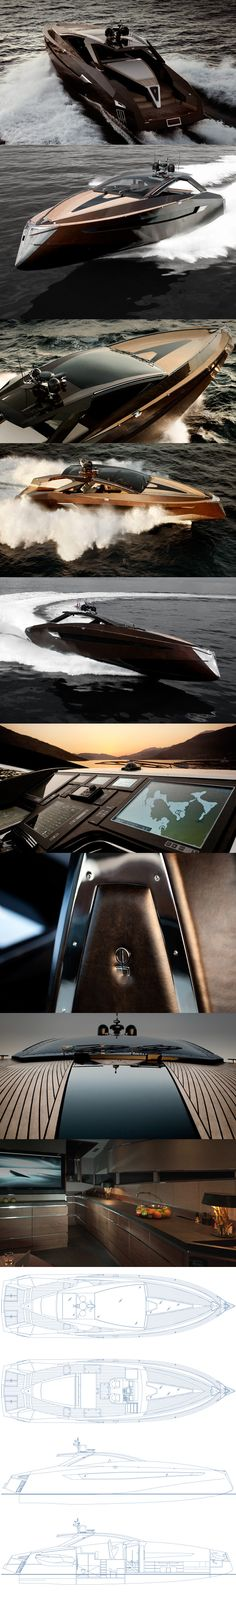 Nobeltec luxury yacht by Kinetik Hedonist